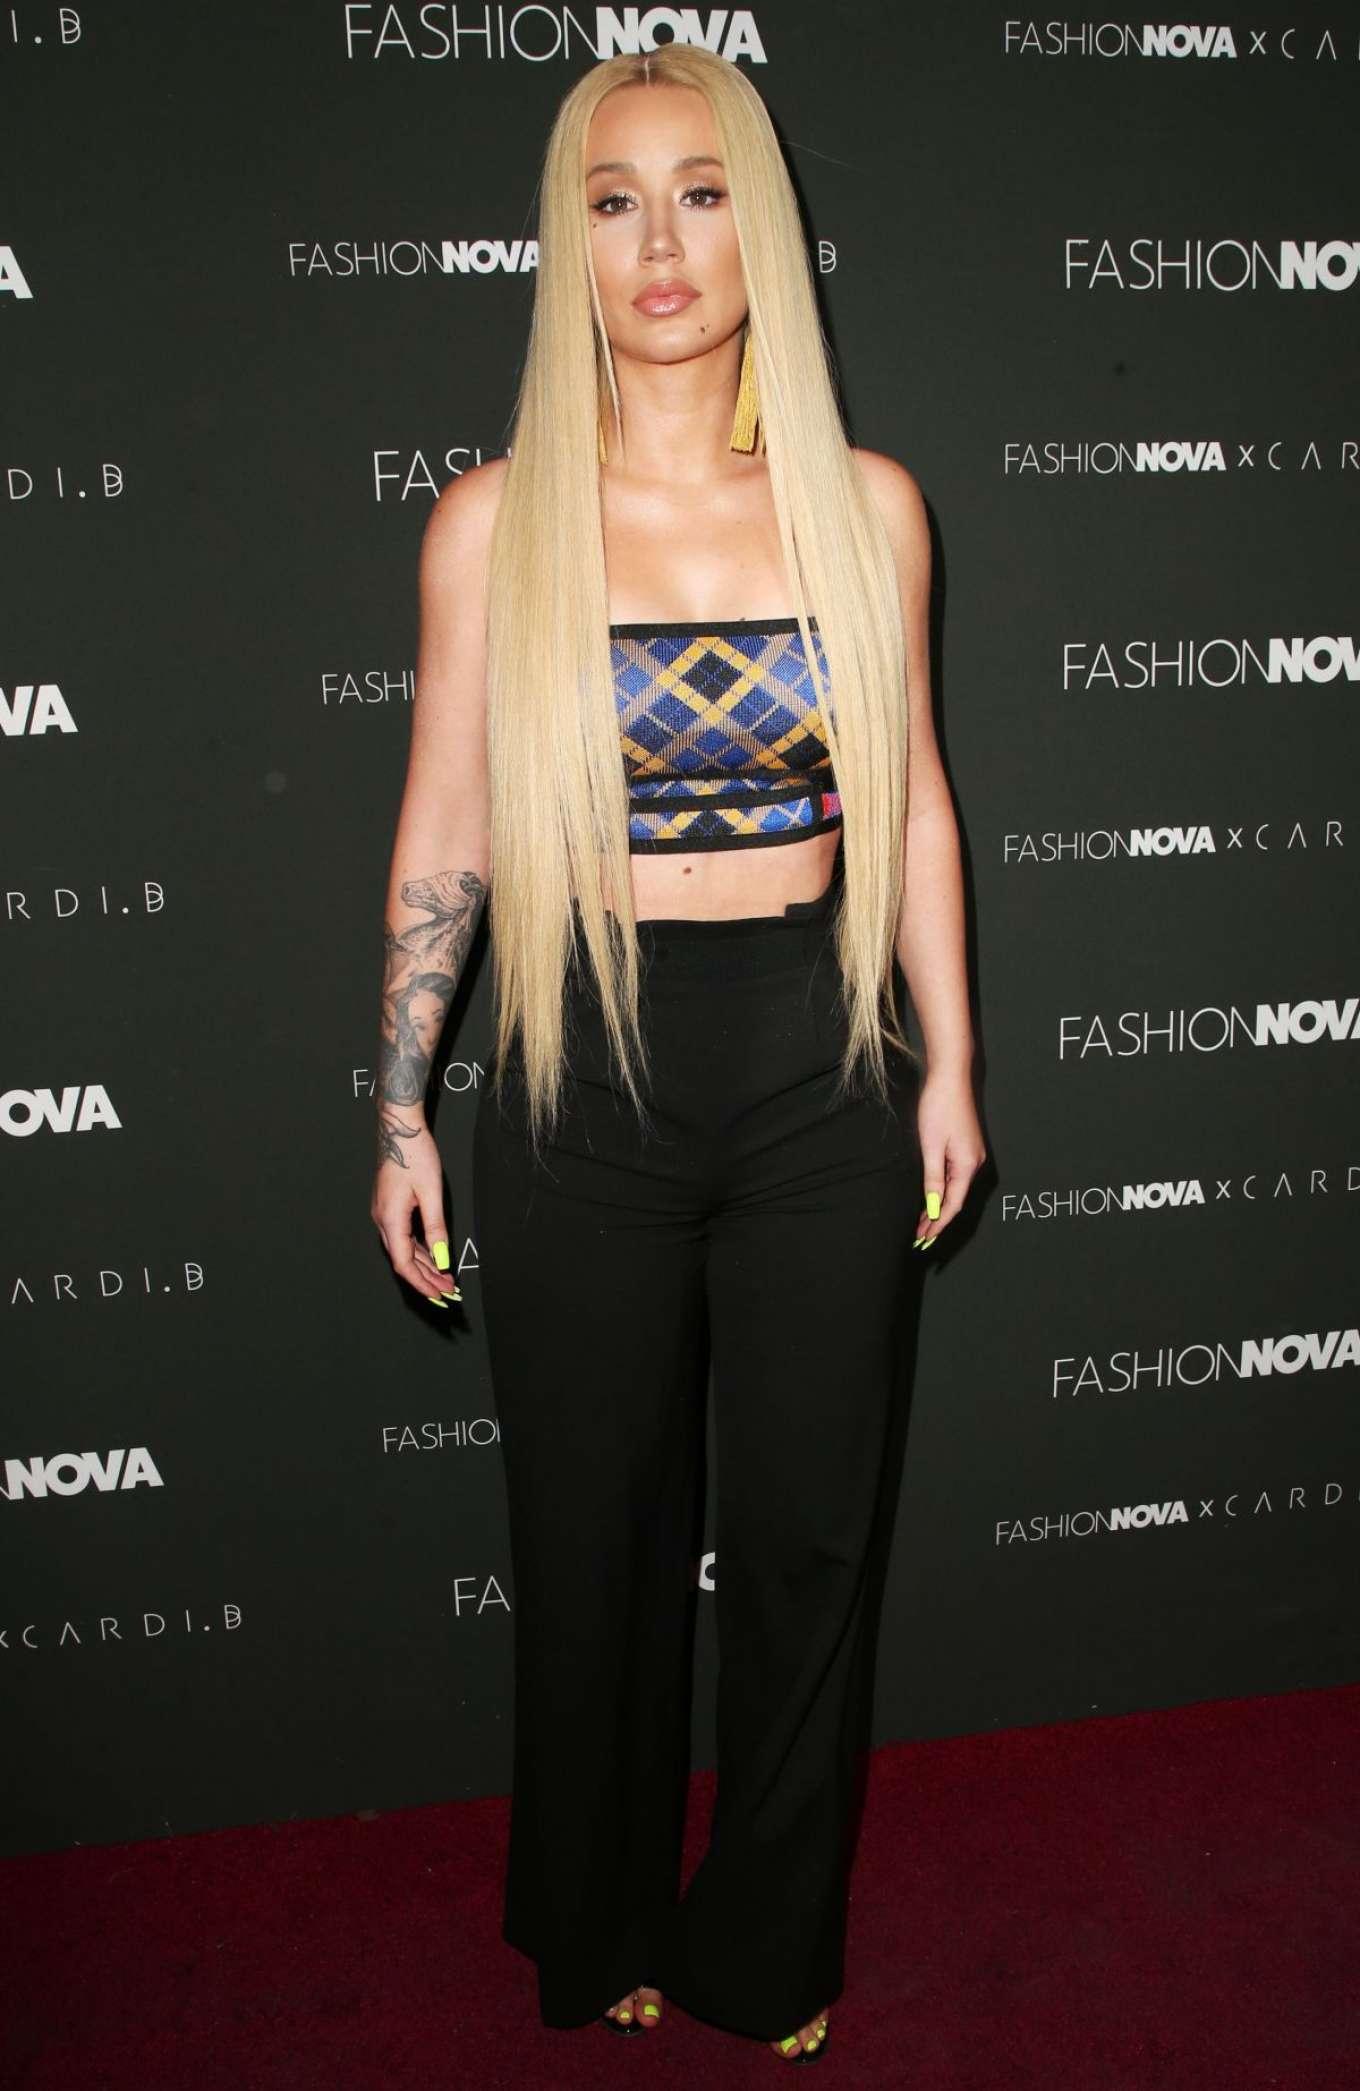 Iggy Azalea 2018 : Iggy Azalea: Fashion Nova x Cardi B Event -01